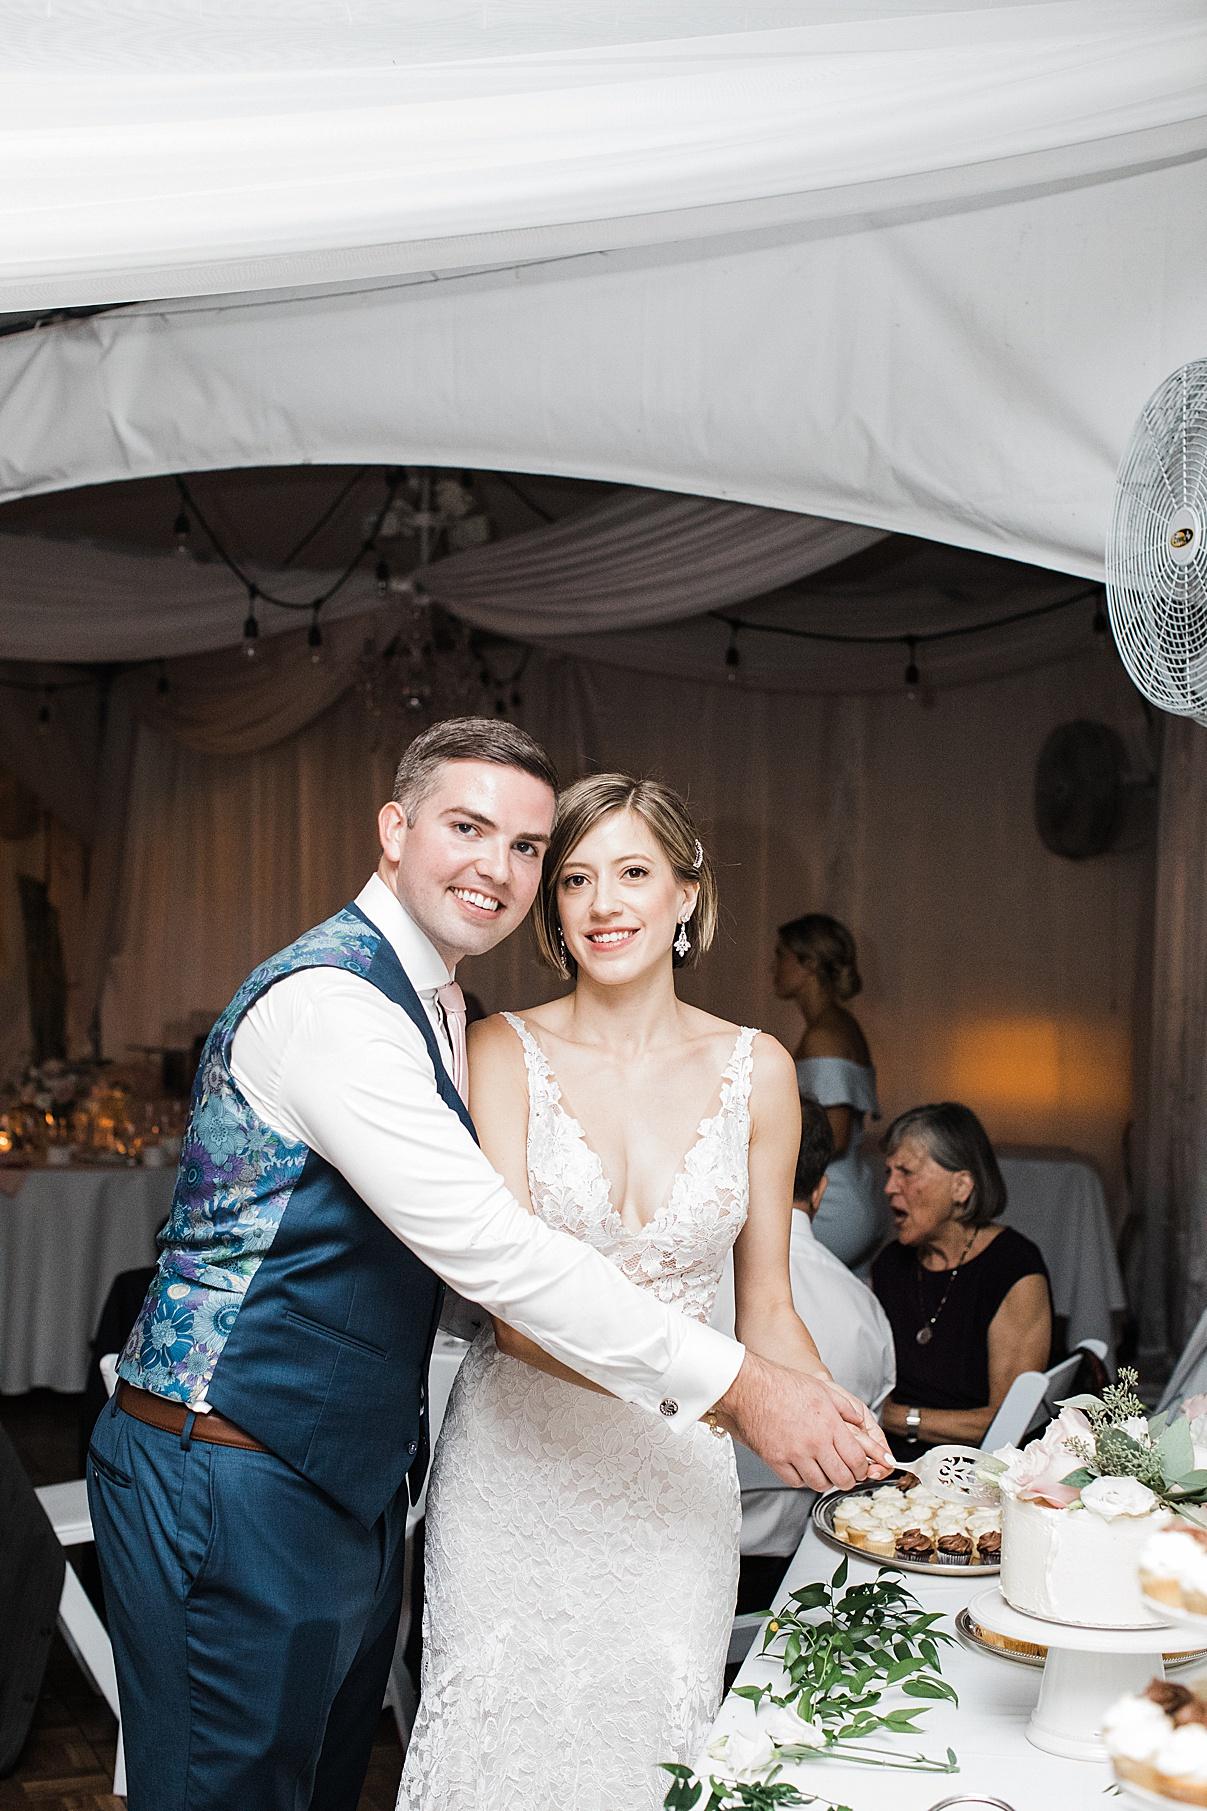 Bride and groom cut cake| Harding Waterfront Estate Wedding| Ontario wedding photographer| Toronto wedding photographer| 3 Photography | 3photography.ca